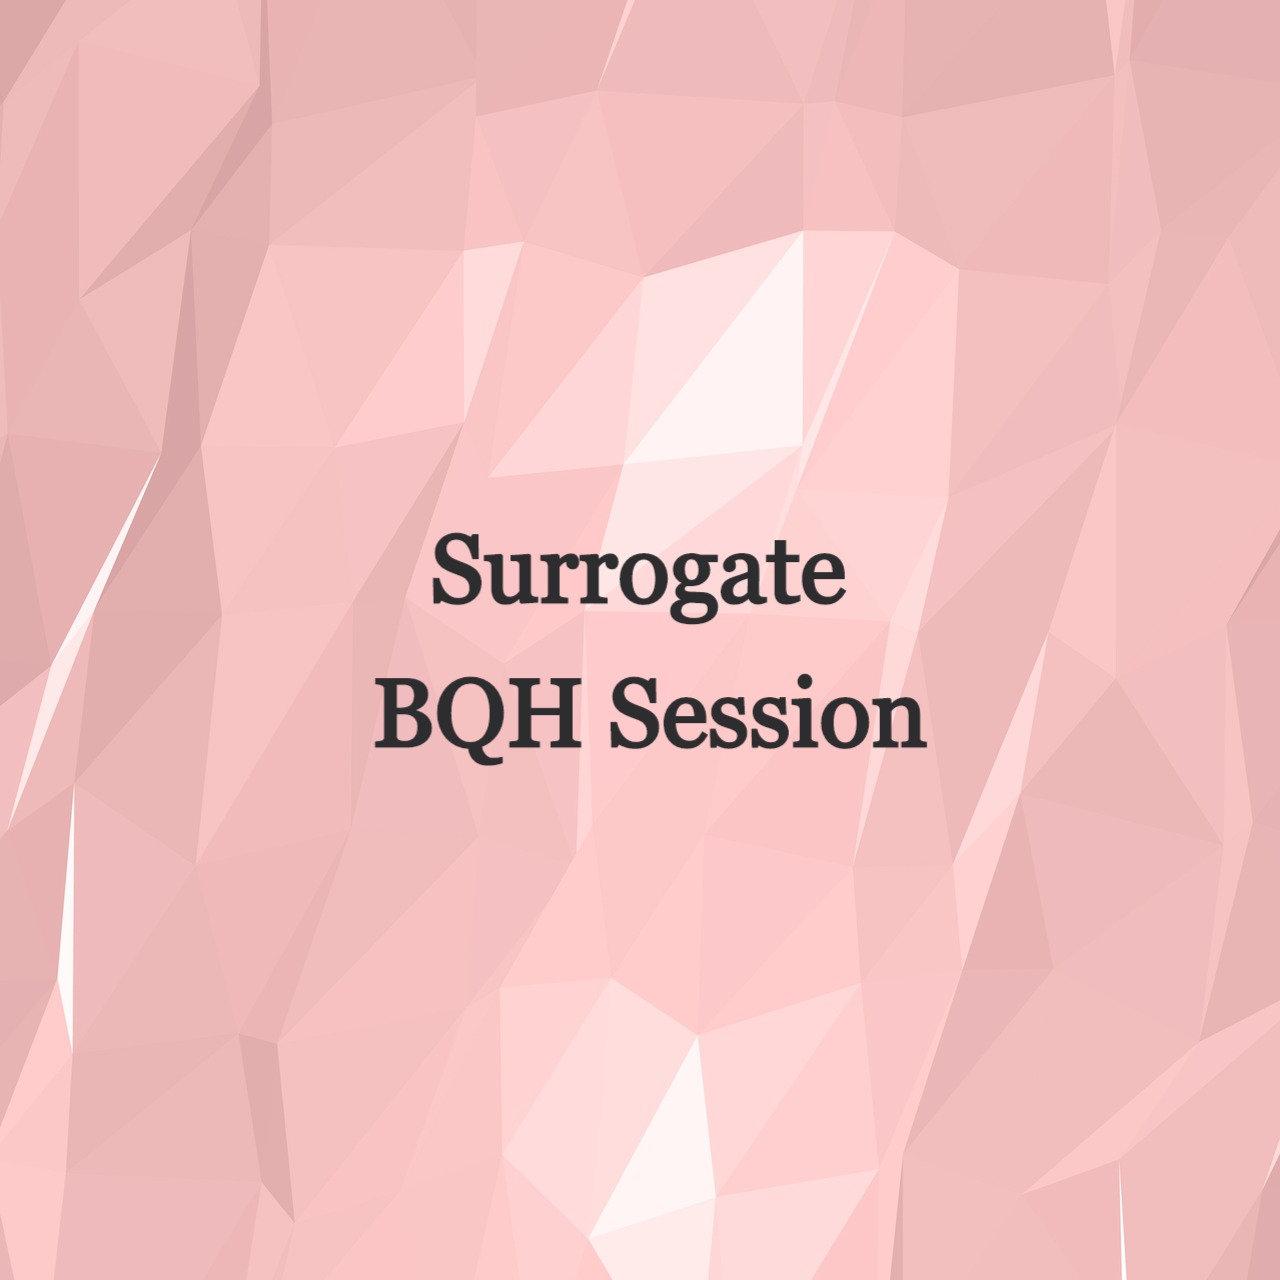 Surrogate BQH Session